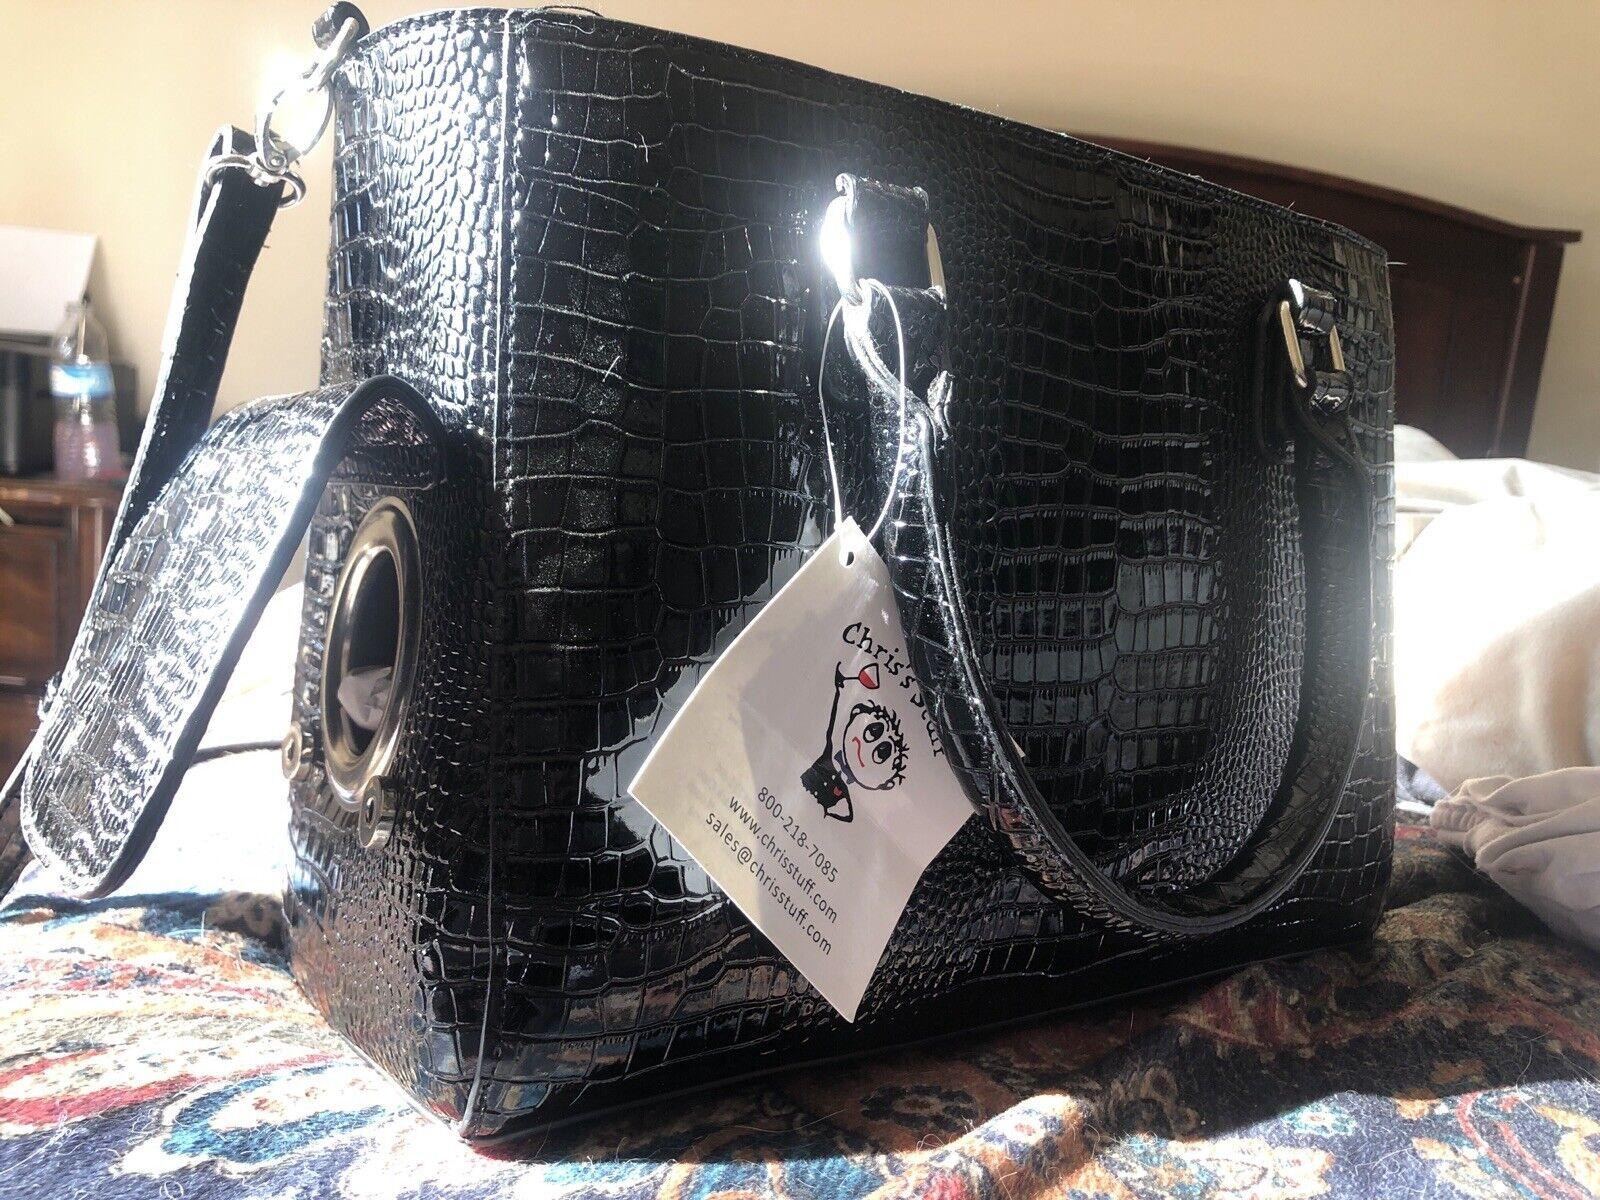 Primeware Black Croc Wine Clutch Insulated Bottle Tote Bag Handbag w// Corkscrew